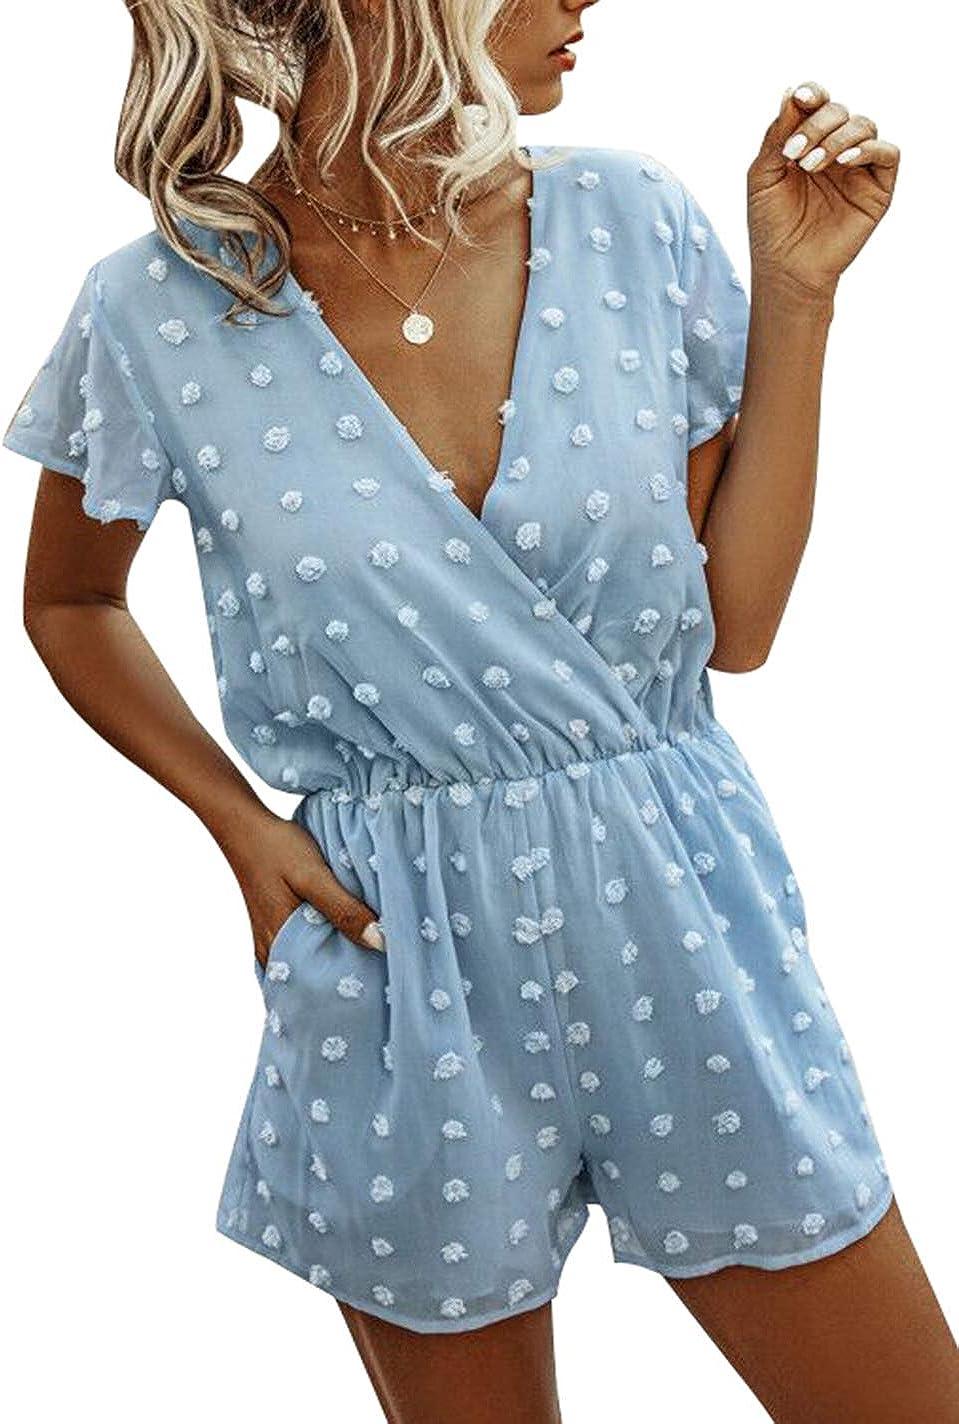 BTFBM Women Fashion Wrap V-Neck Swiss Dot Print Soft Short Sleeve Elastic Waist Plain Summer Shorts Jumpsuit Romper